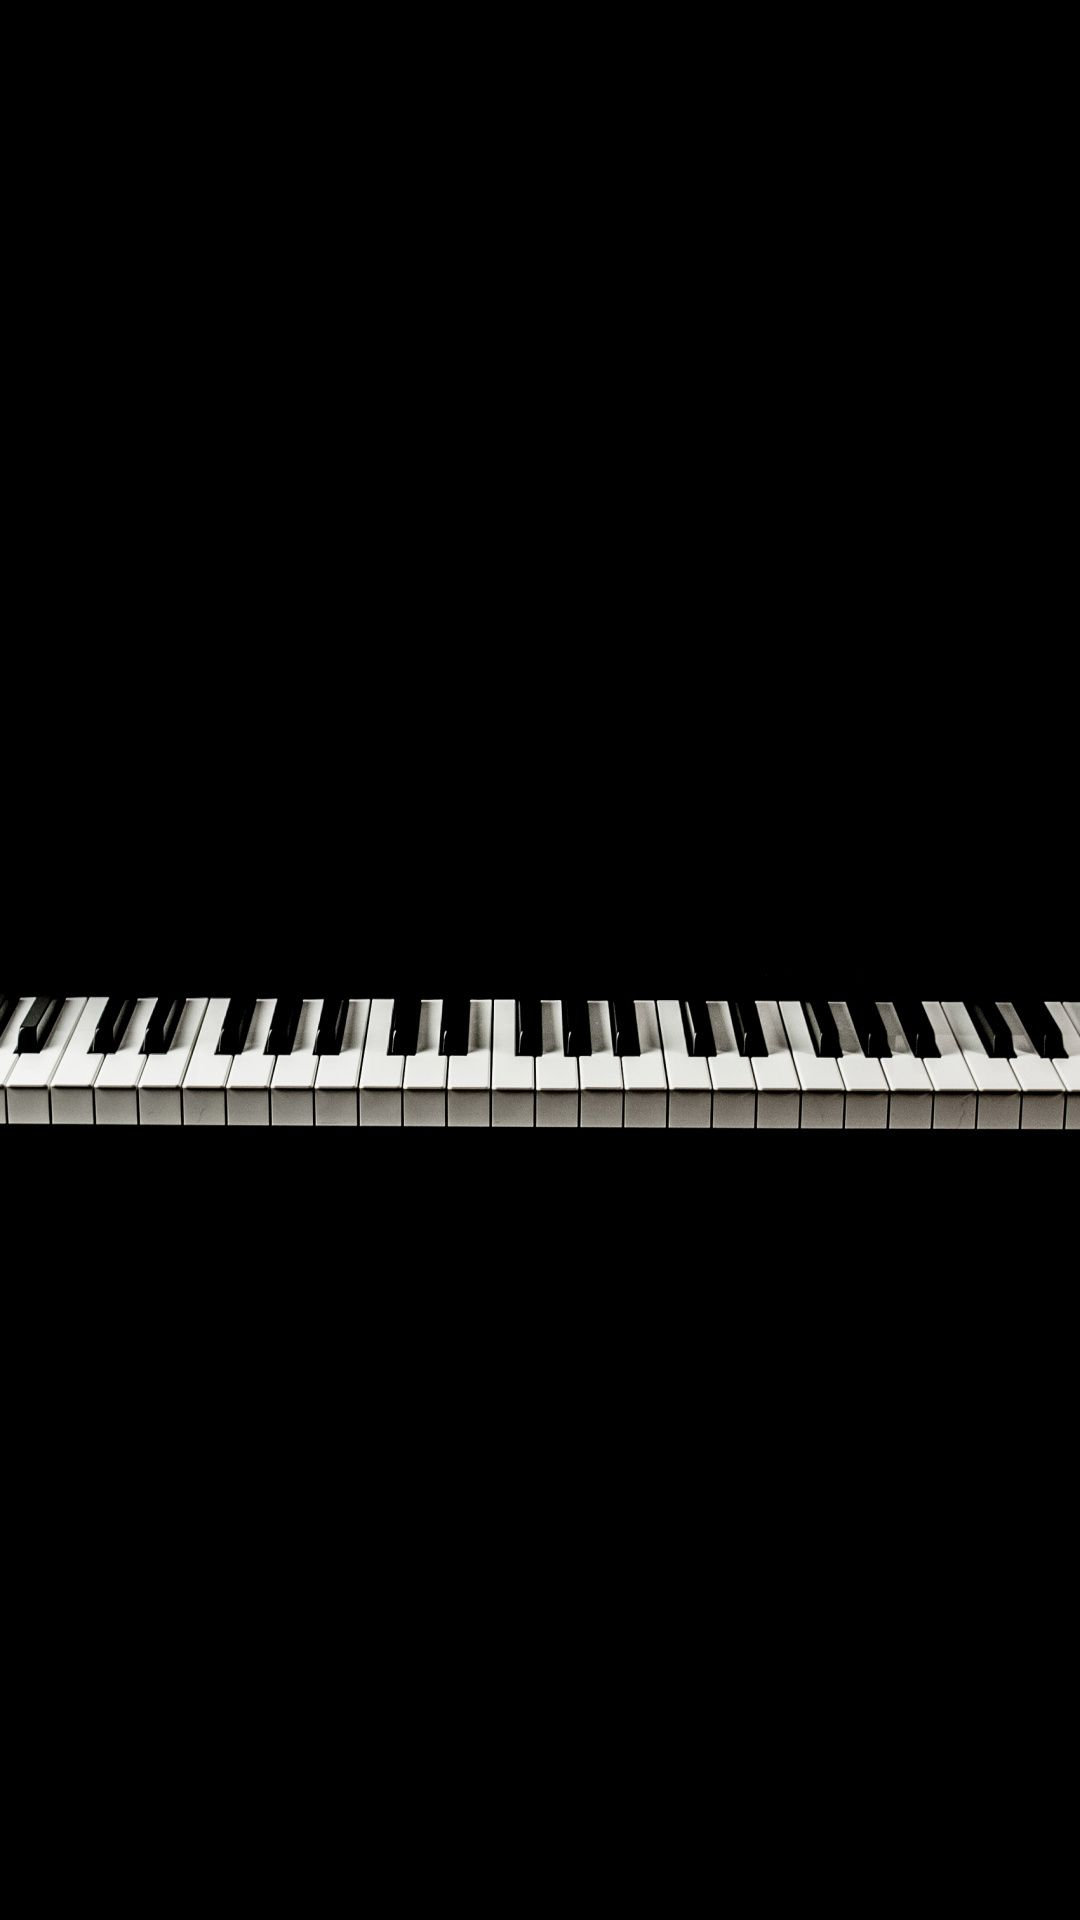 Wallpapers Tech Electronic Device Electric Piano Piano Musical Keyboard Piano Iphone Wallpaper Music Music Wallpaper